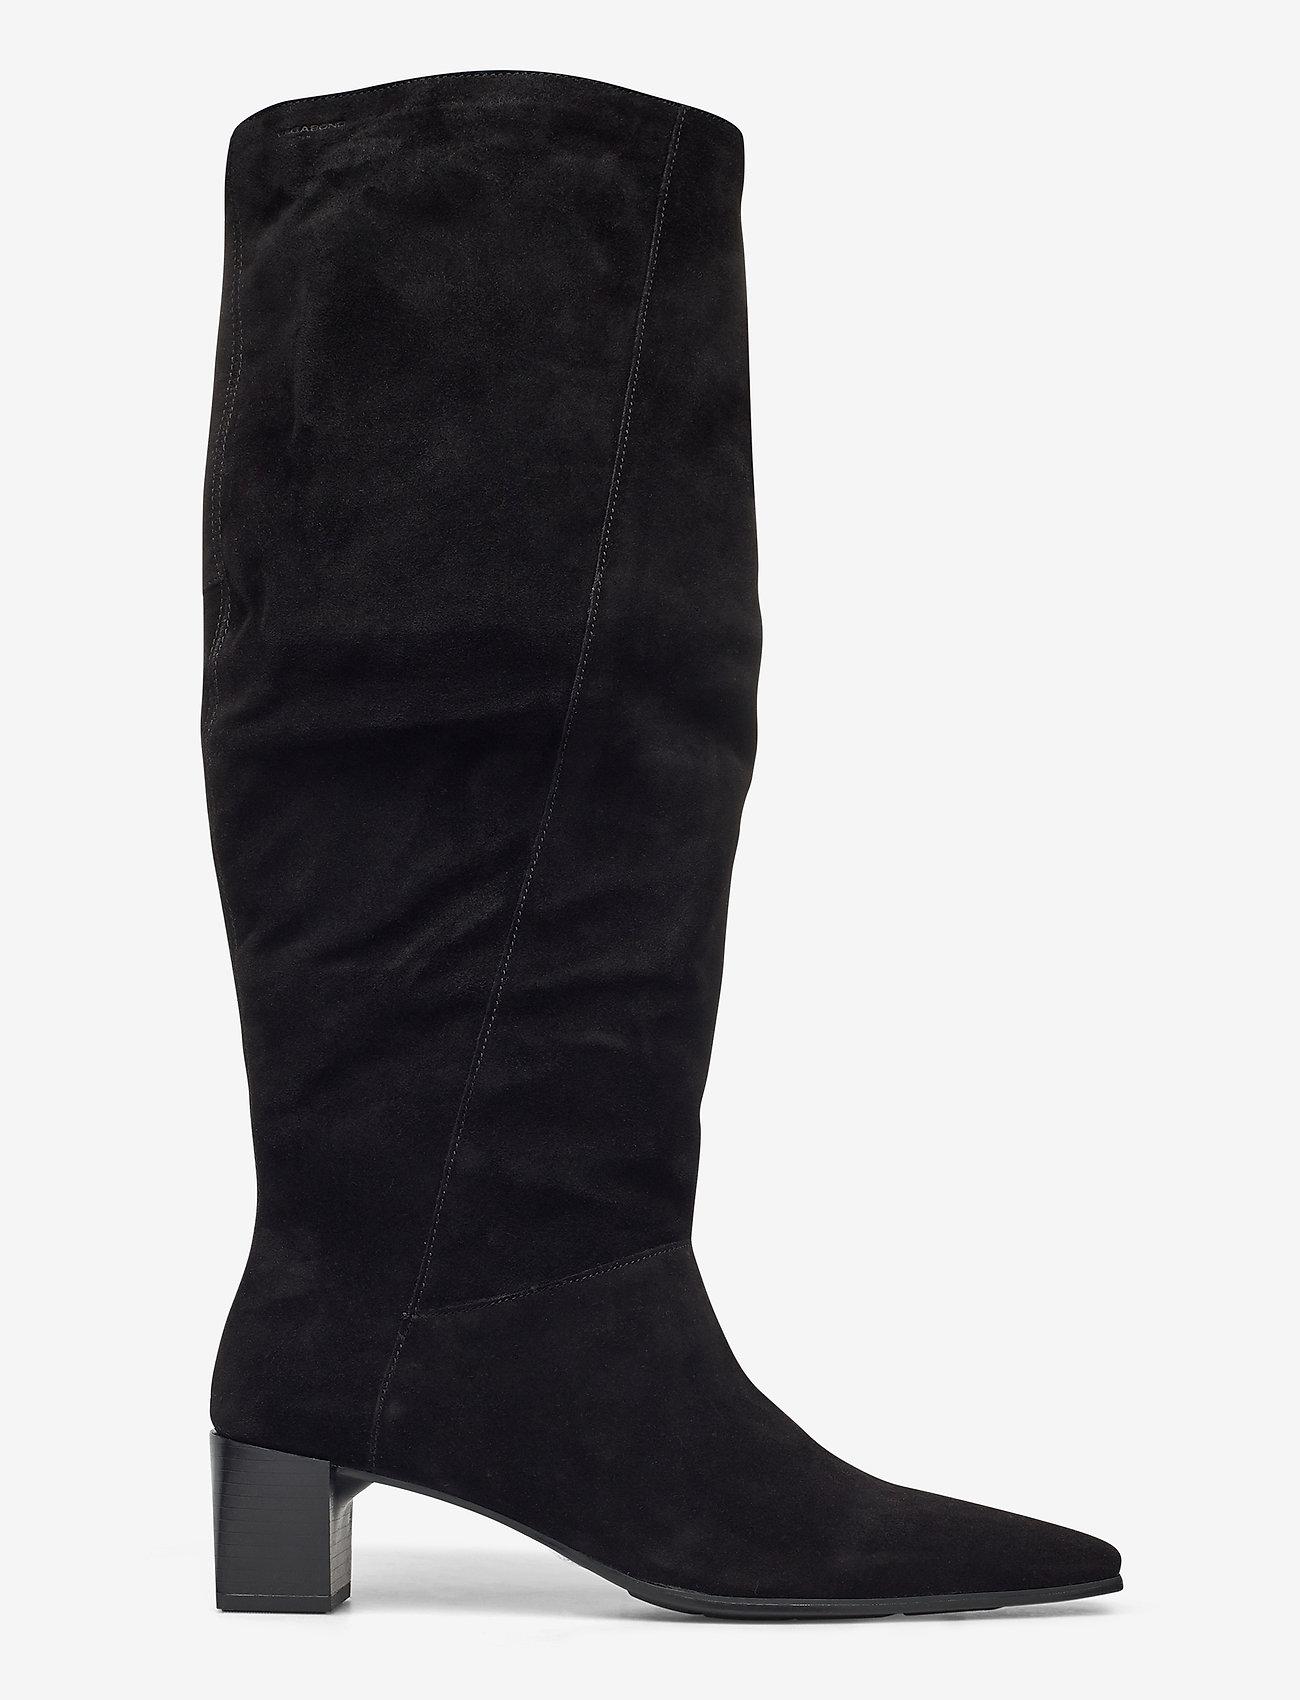 VAGABOND - GABI - lange laarzen - black - 1